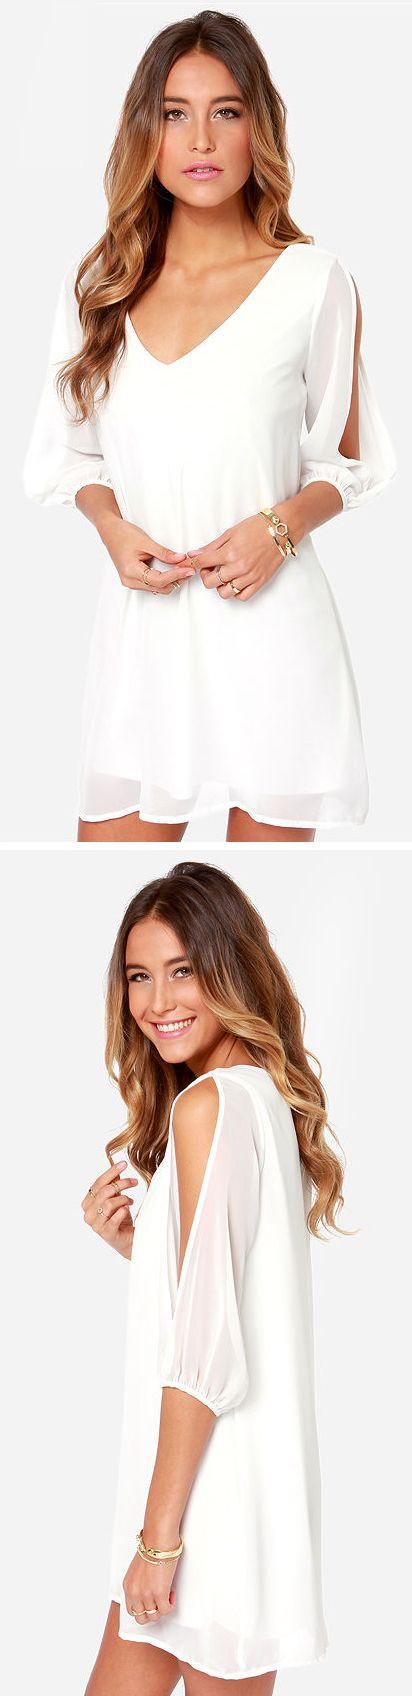 LULUS Exclusive Shifting Dears Ivory Long Sleeve Dress - maroon dresses casual, elegant dresses, glamorous dresses *sponsored https://www.pinterest.com/dresses_dress/ https://www.pinterest.com/explore/dress/ https://www.pinterest.com/dresses_dress/girls-dresses/ http://www.davidsbridal.com/sale/sale-wedding-dresses